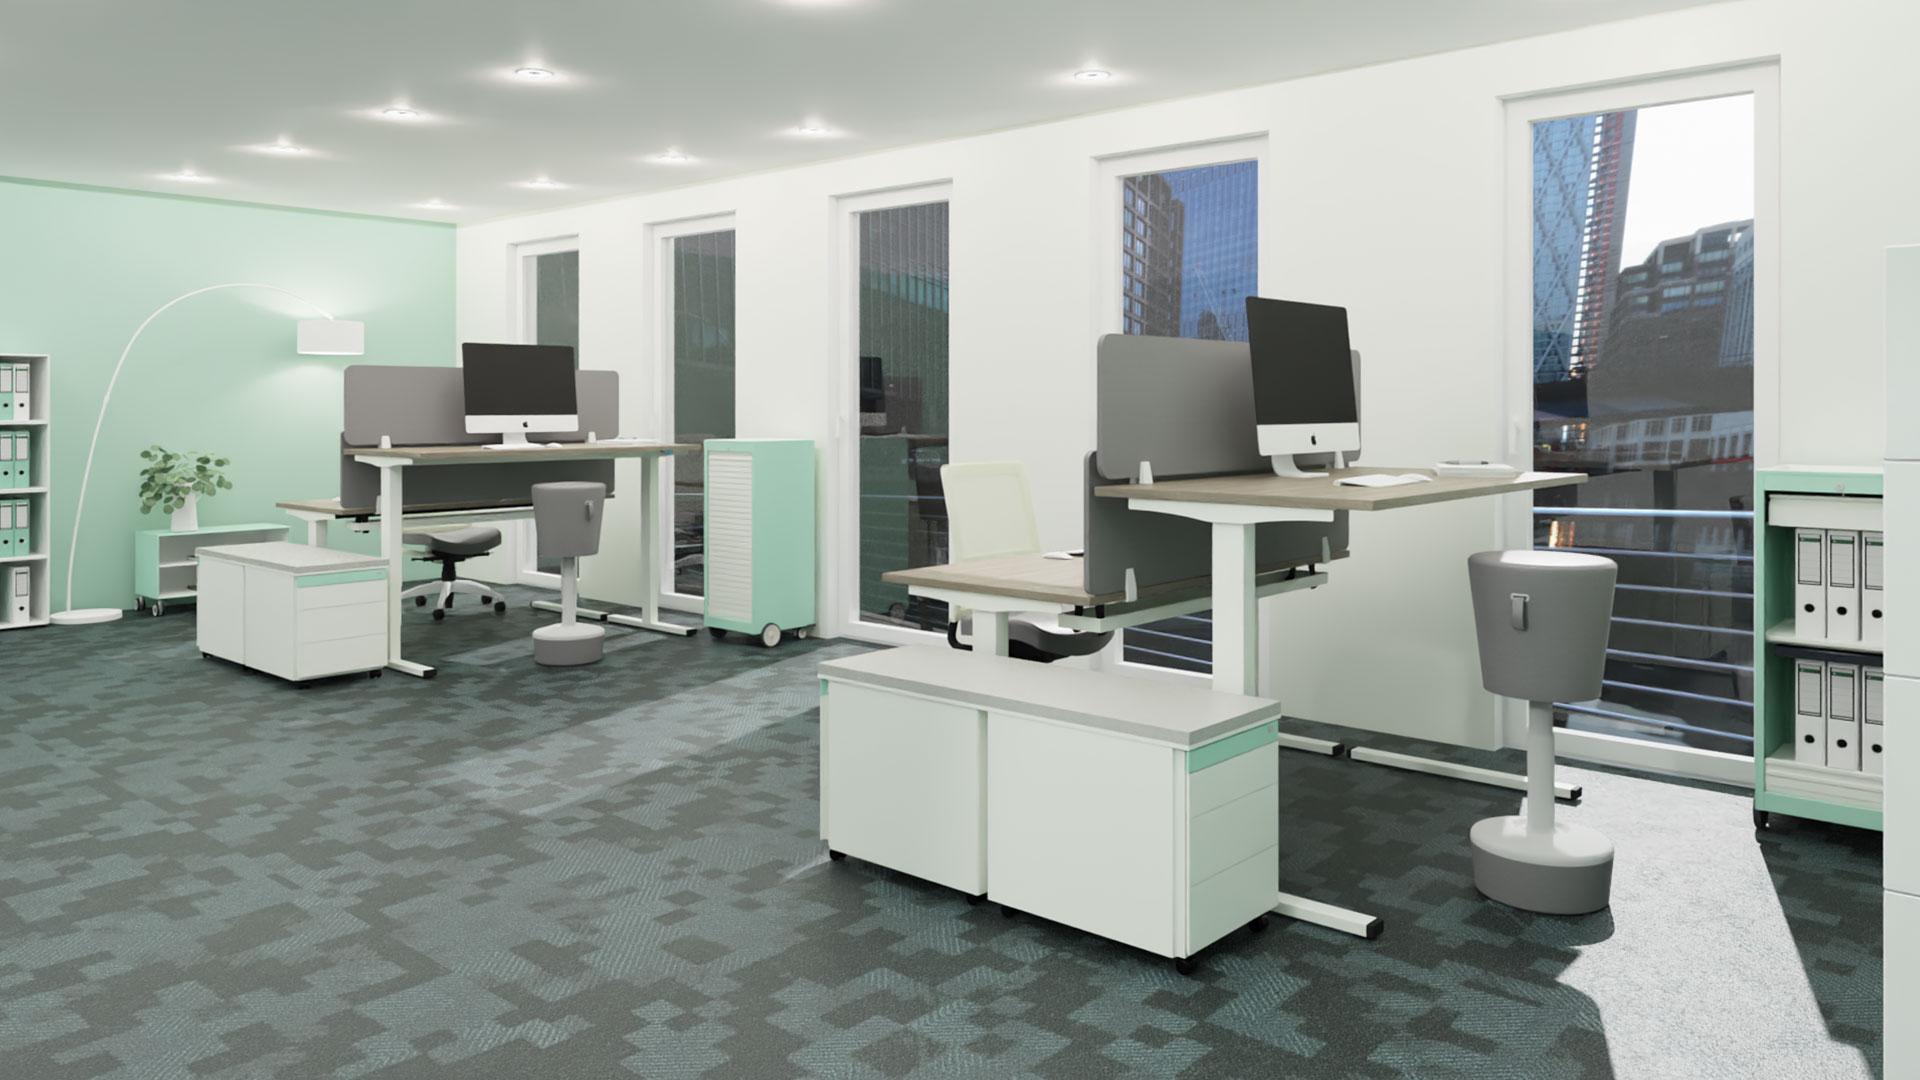 Softboard-Akustik-Aufsatzelement-grau-coworking-space-mauser Softboard Akustik-/Aufsatzelemnt z. B. im coworking space